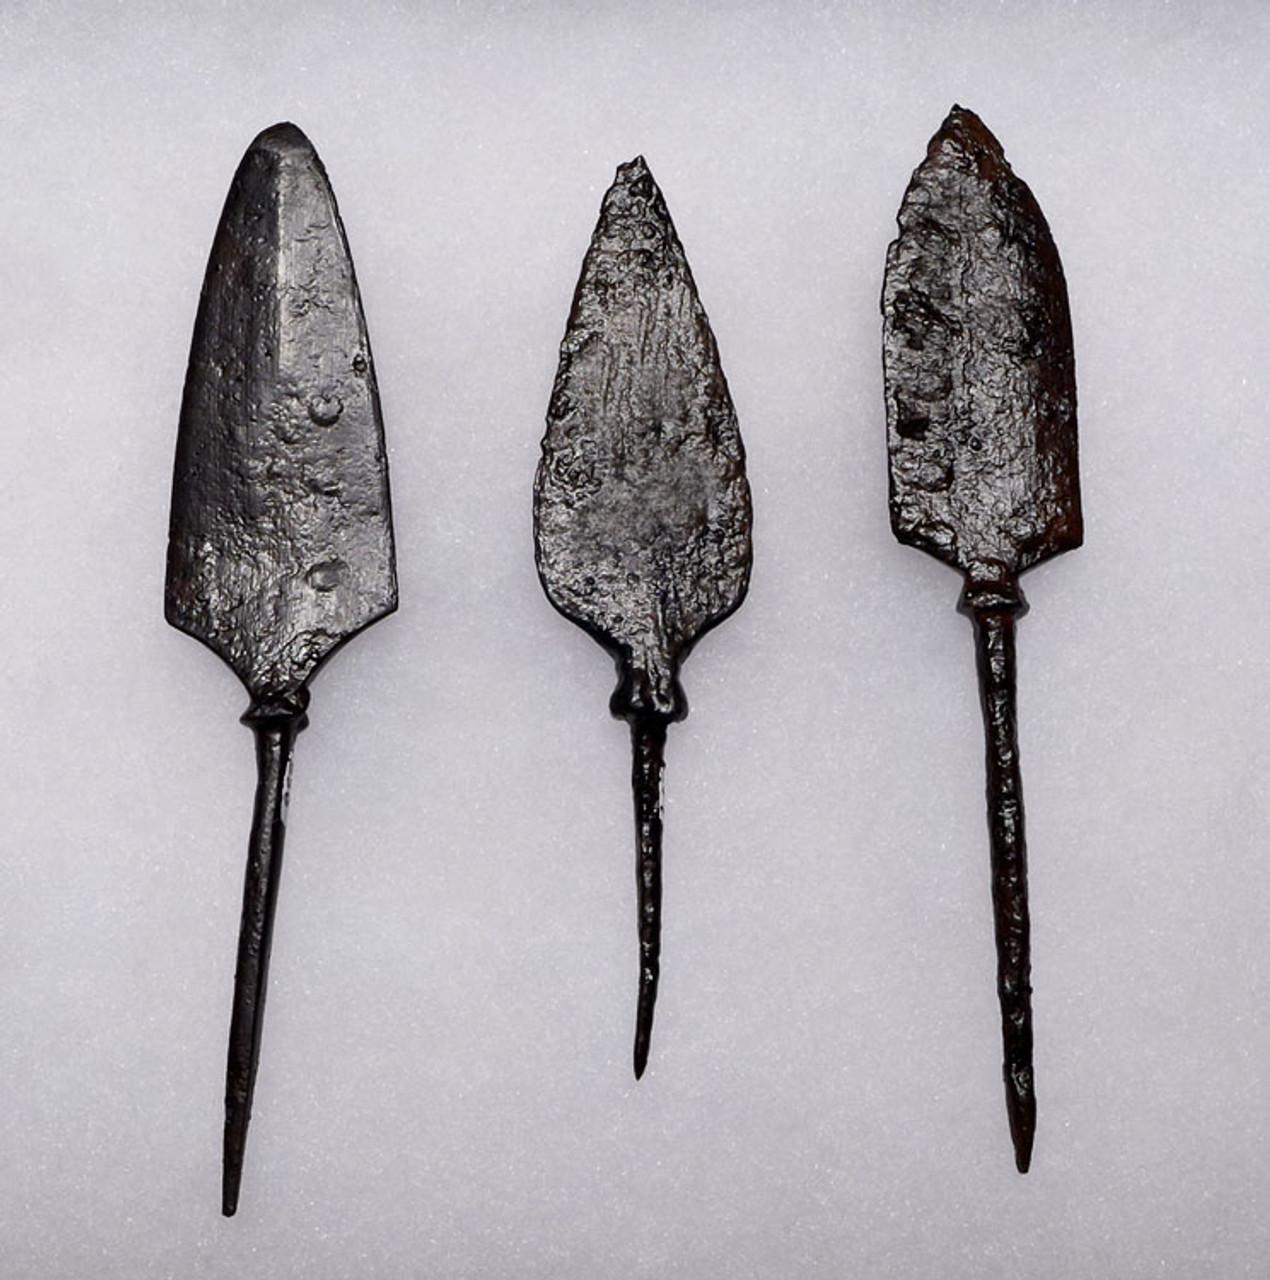 R151 - SET OF 3 ROMAN IRON ARROWHEADS FROM THE BYZANTINE ERA